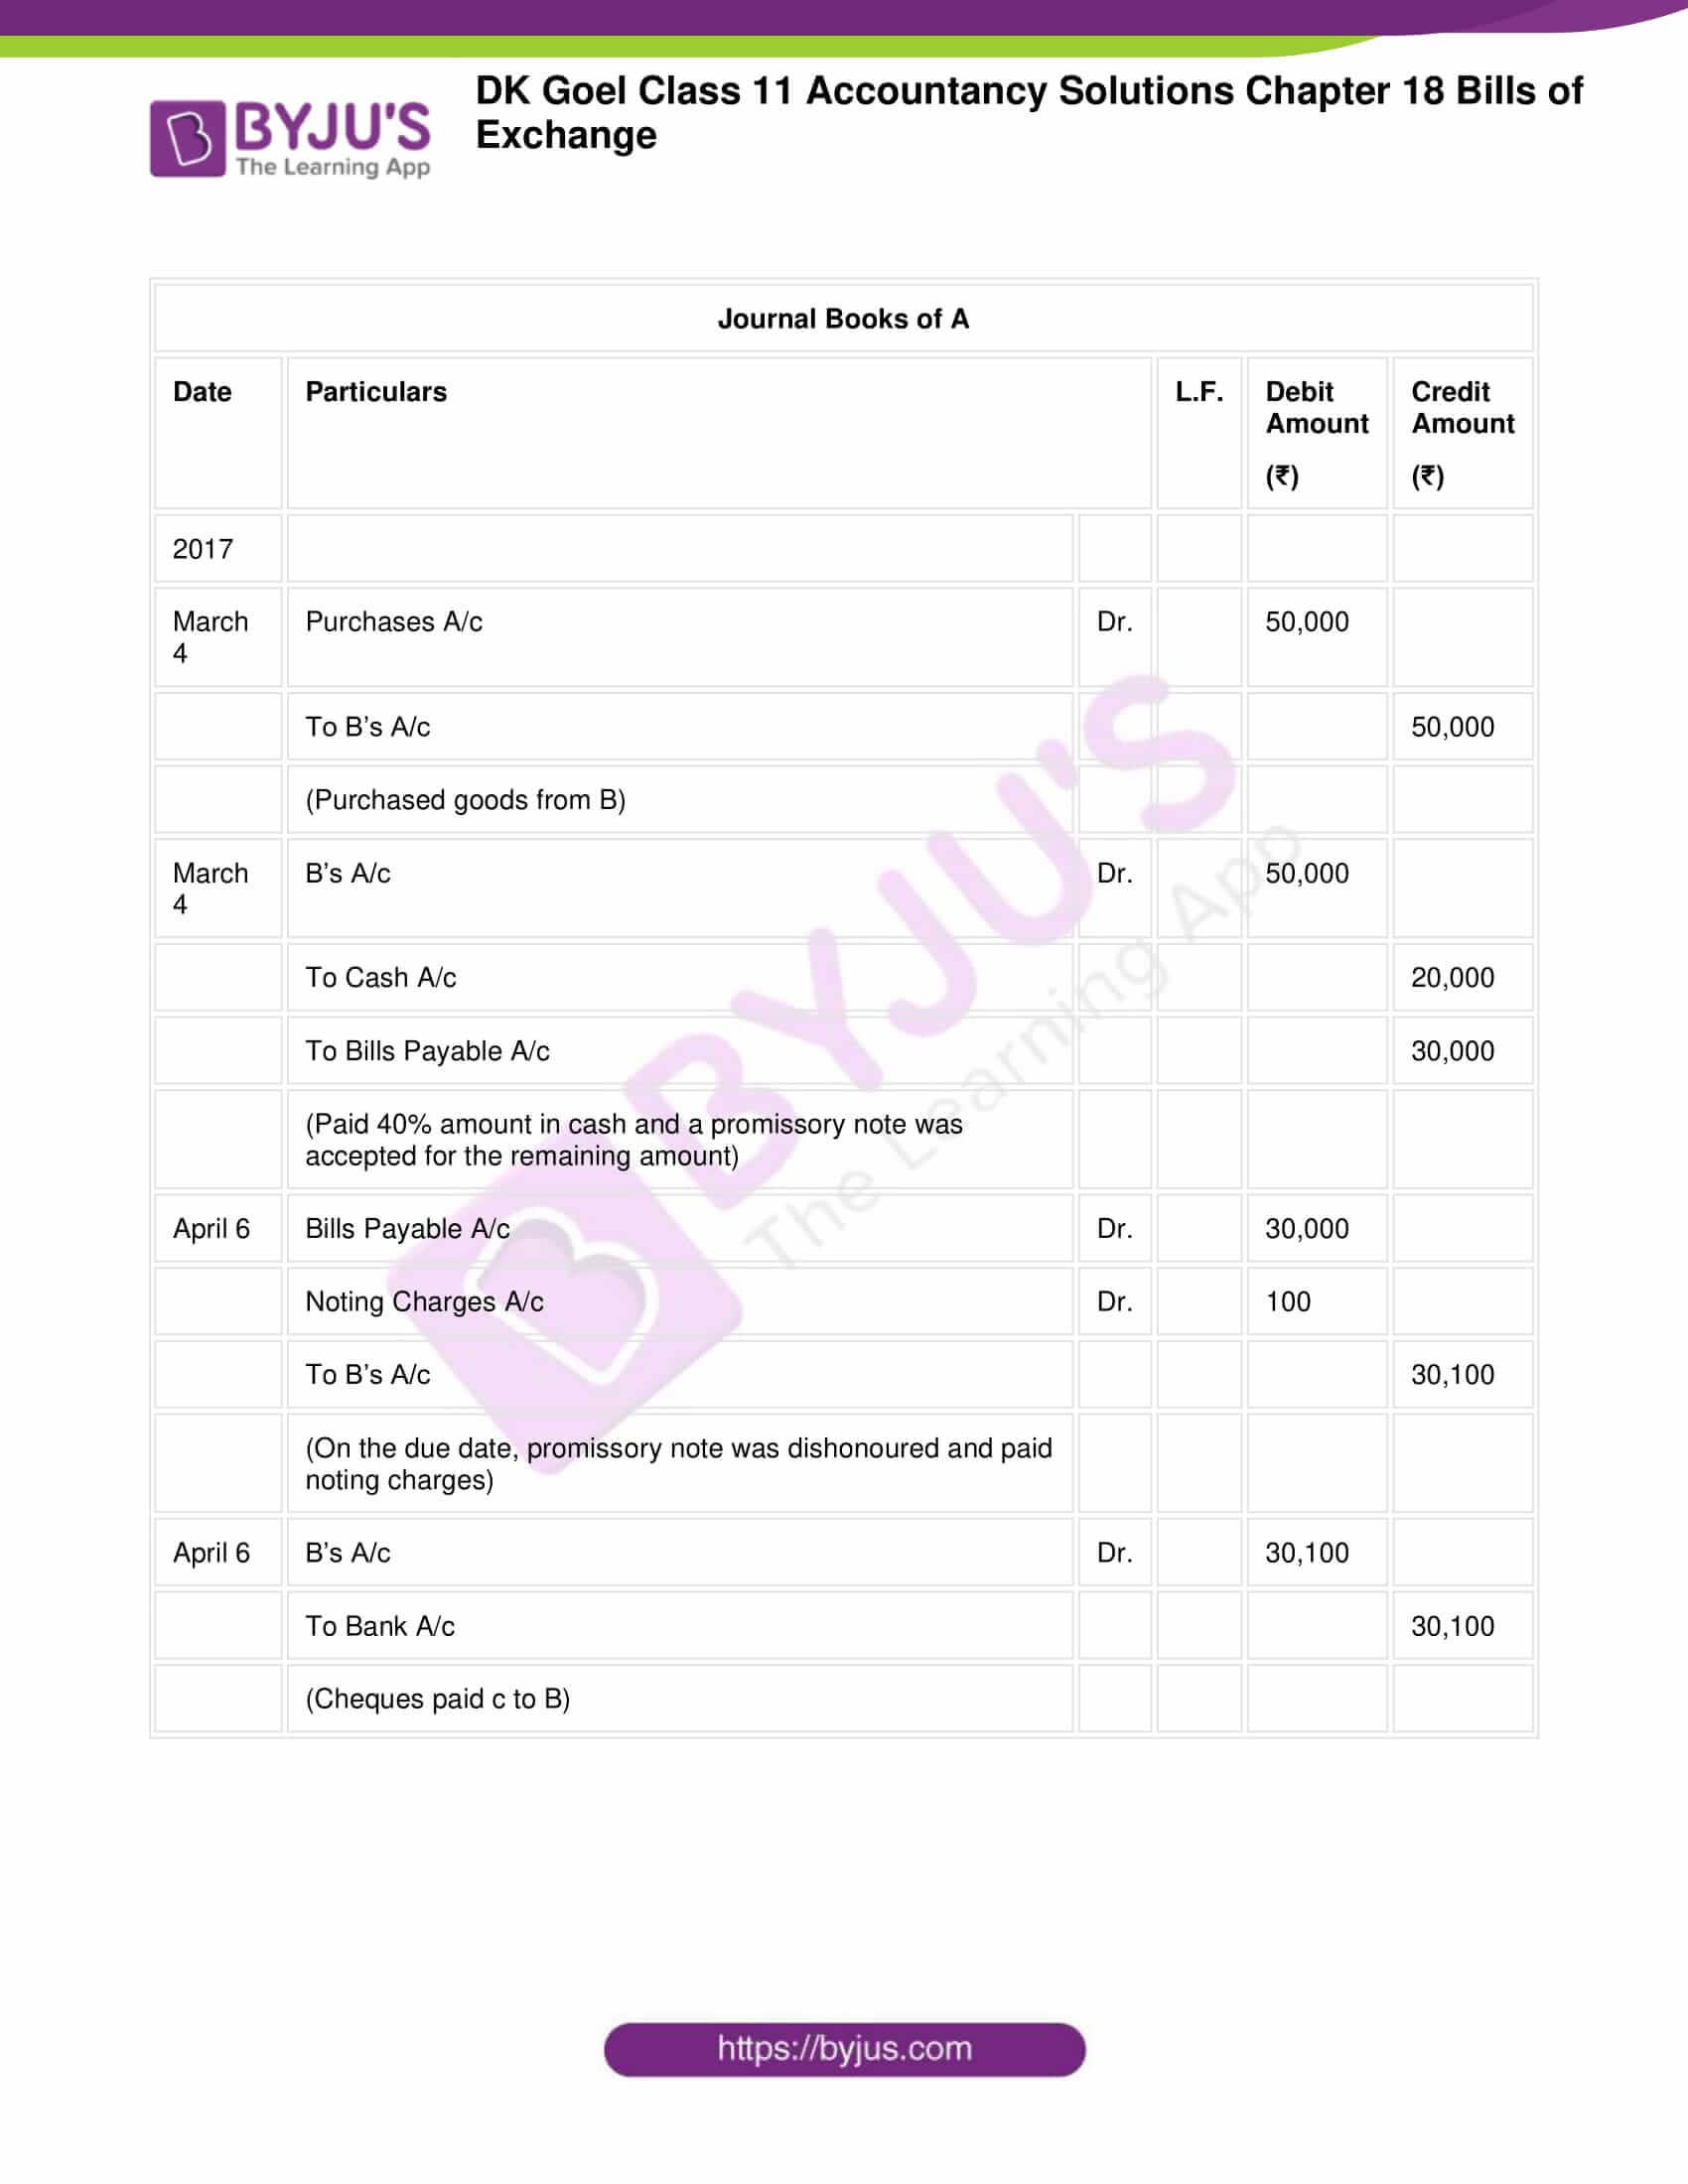 dk goel class 11 accountancy solutions chapter 18 056